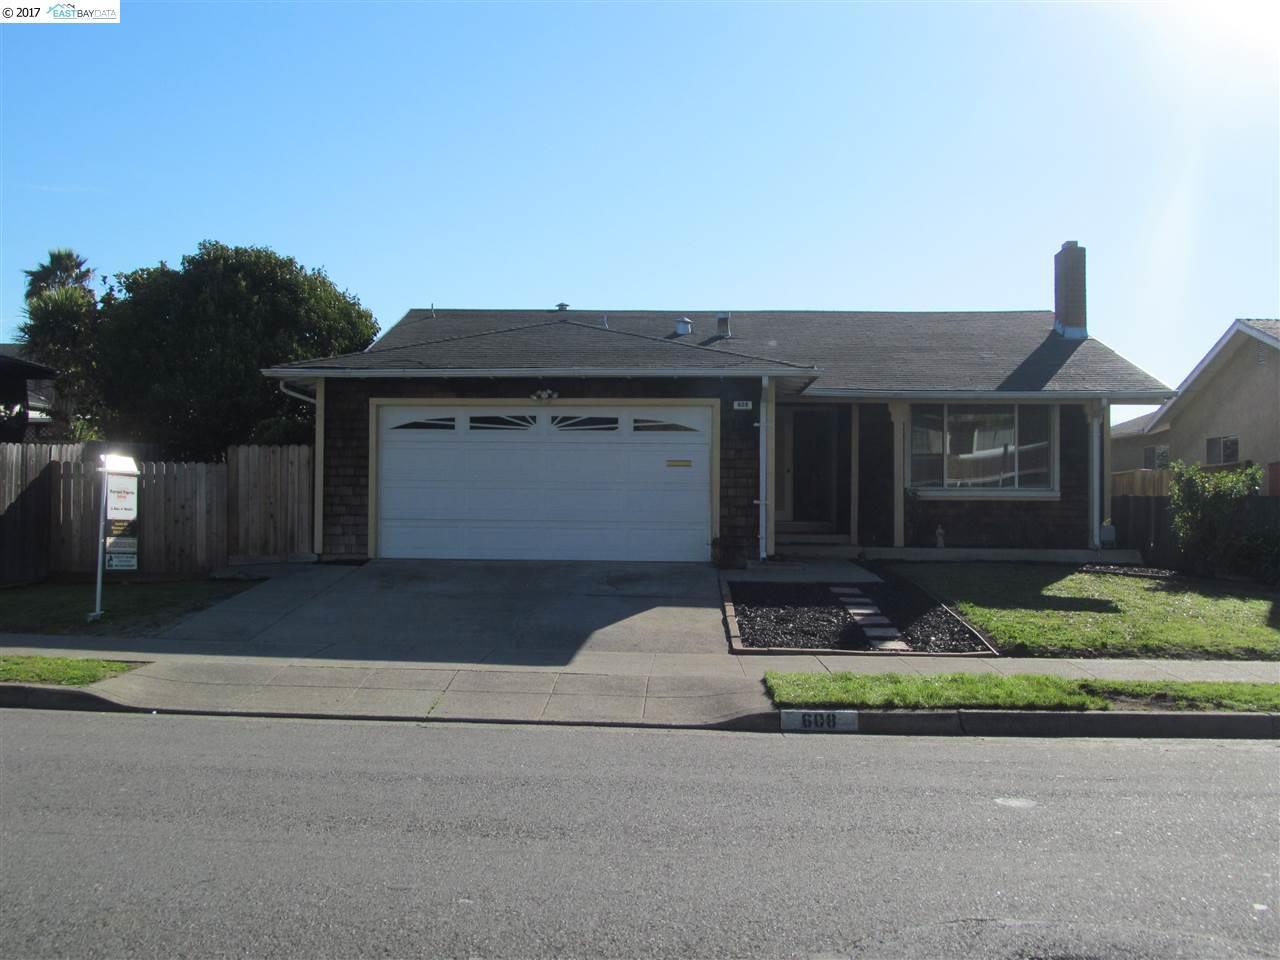 608 S 49TH ST, RICHMOND, CA 94804